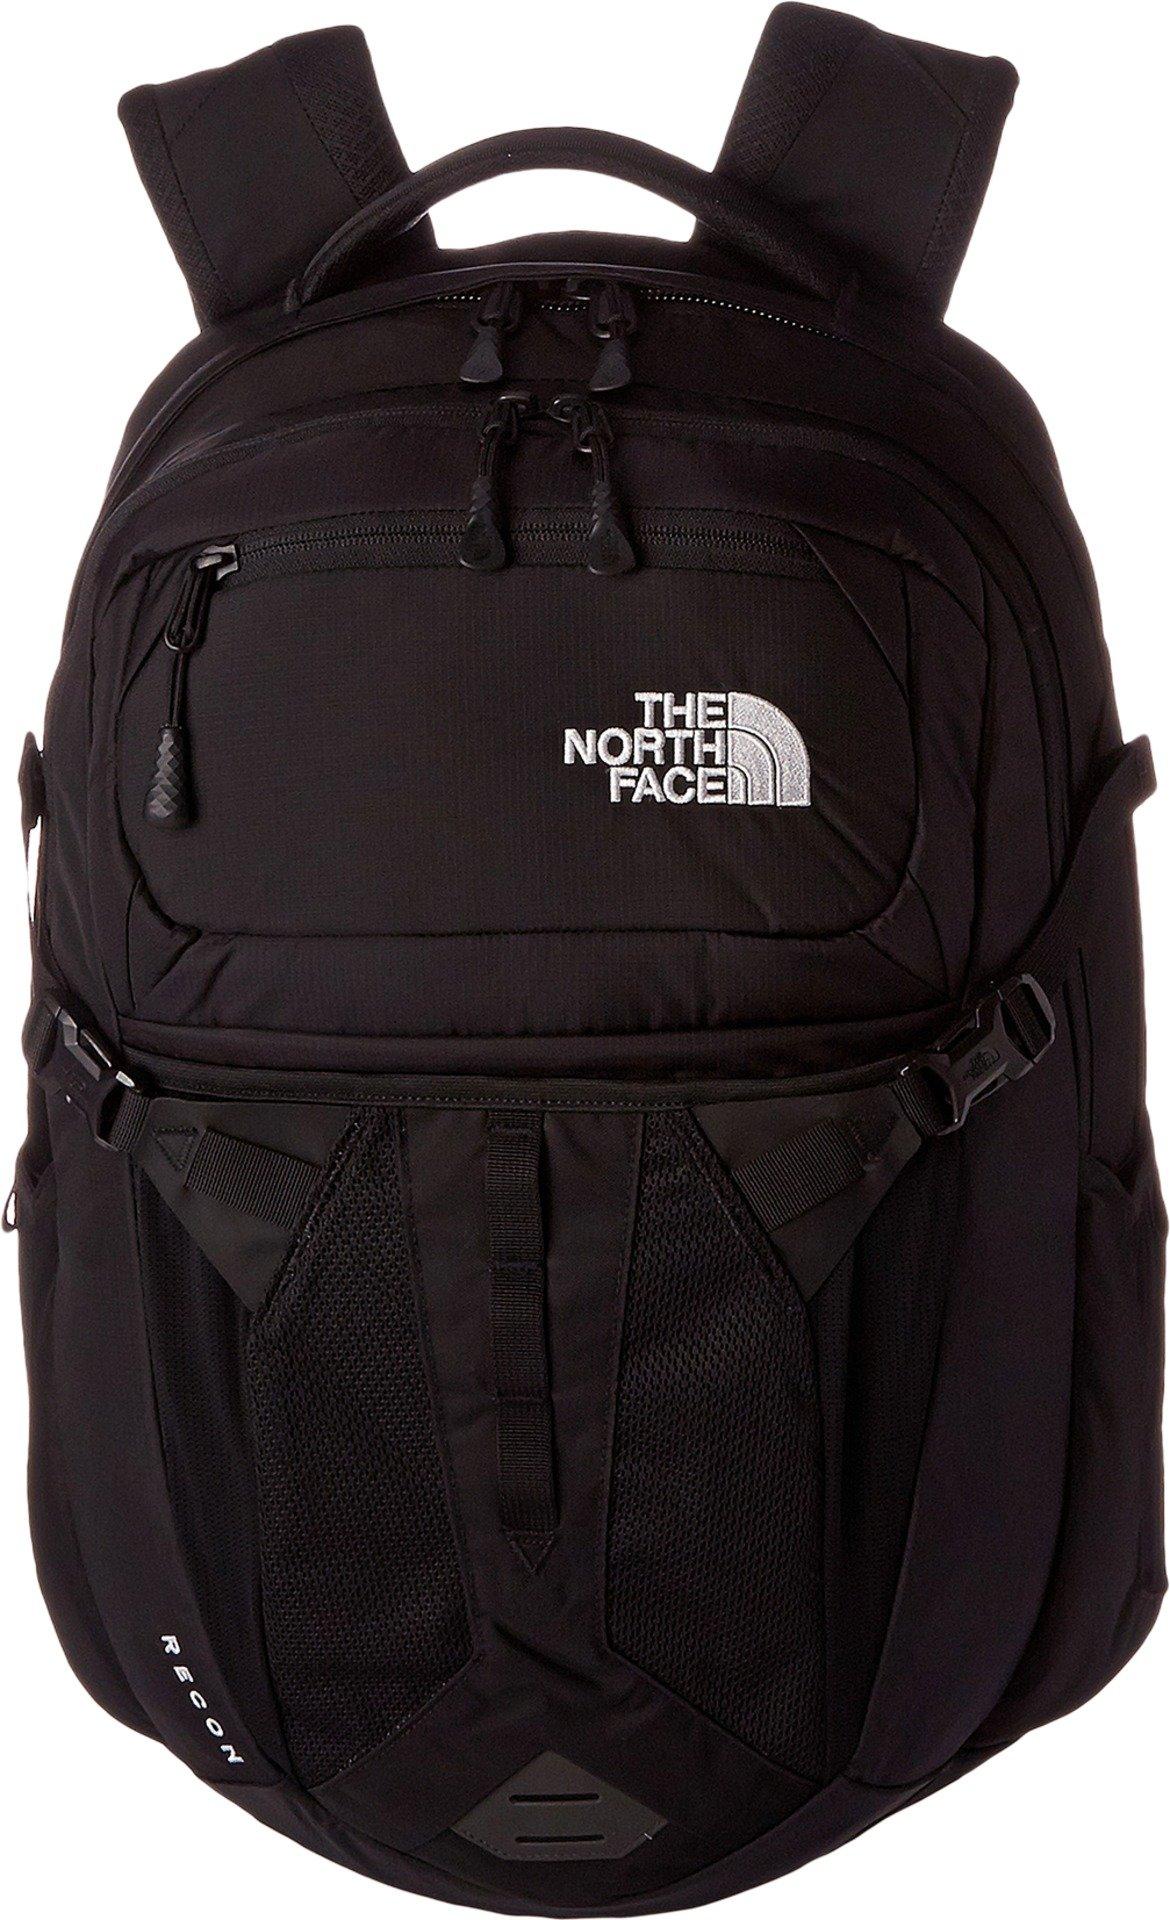 The North Face Recon TNF Black One Size